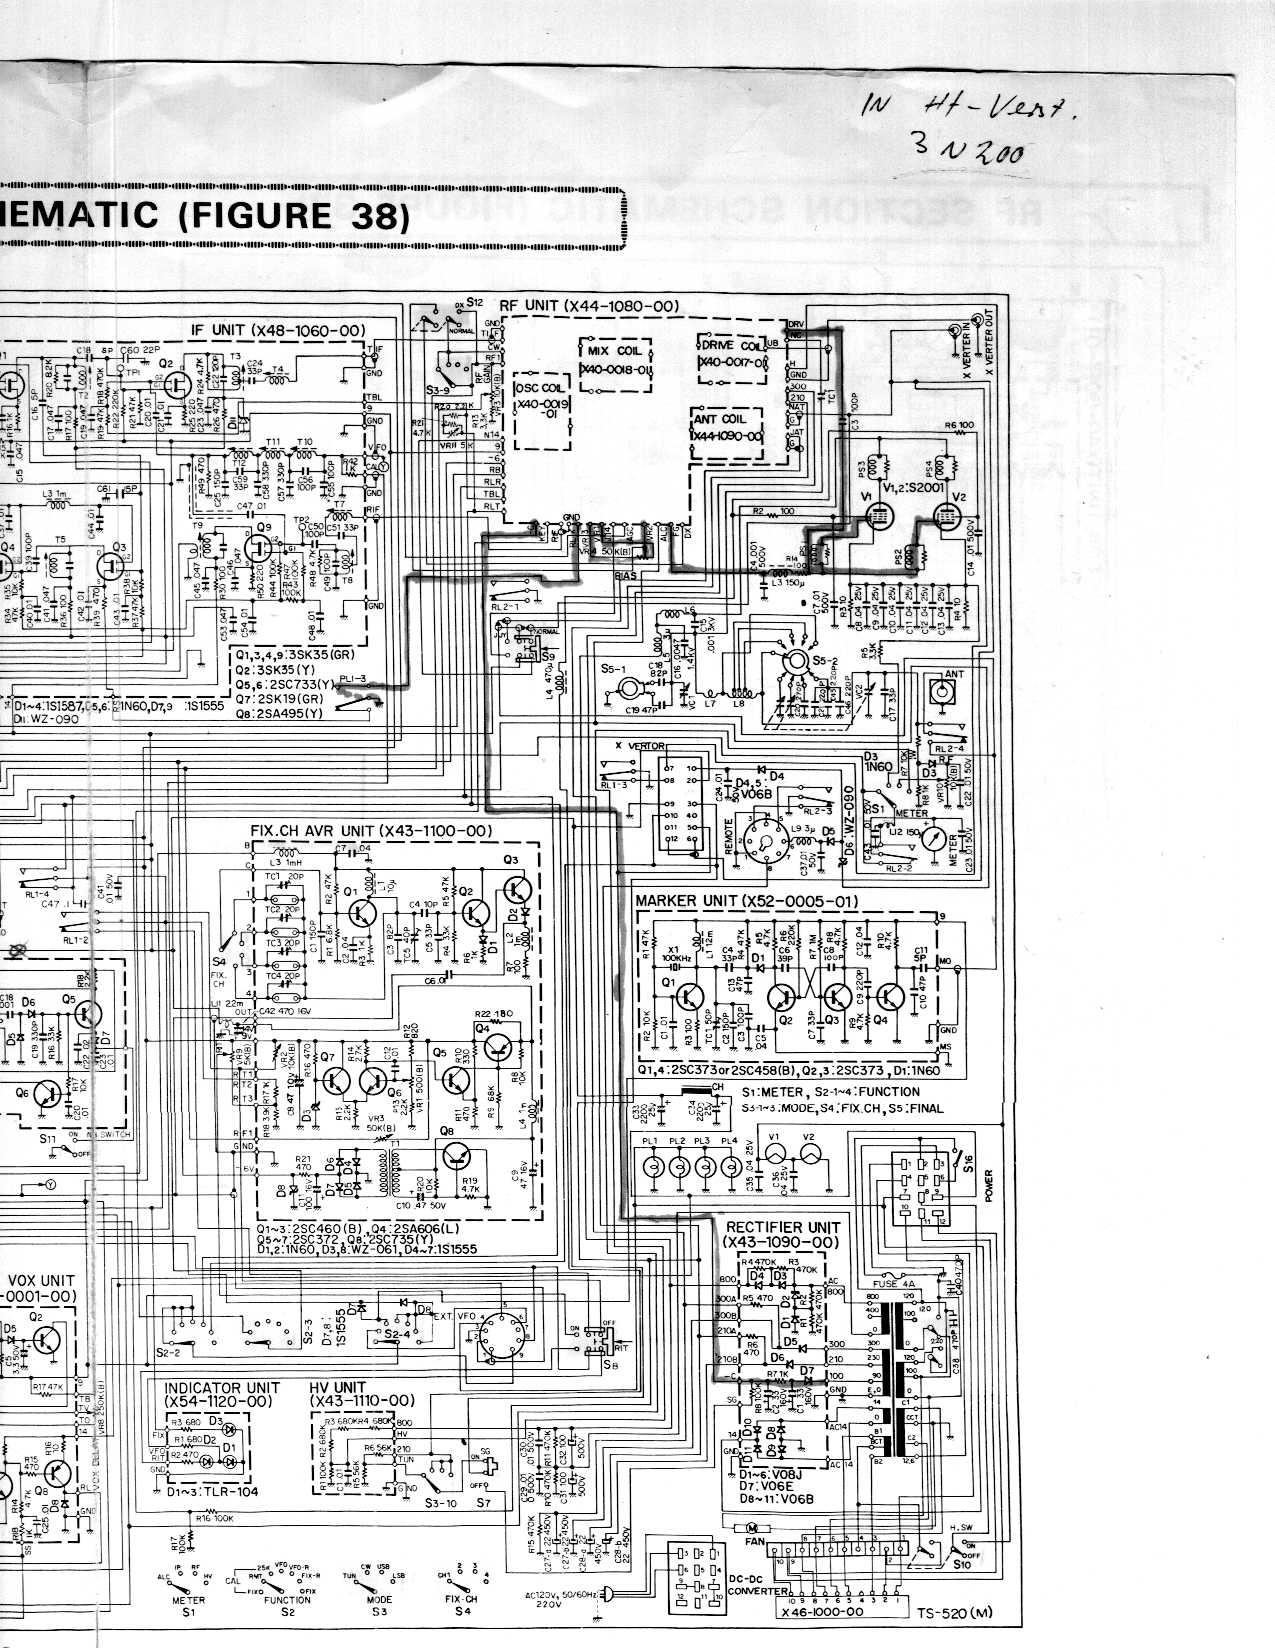 Amateur Radio Manuals Schematics additionally Intertherm Model M1mb Furnace Wiring Diagram further 855249 User Manual together with 853038 User Manual furthermore 993 Repair Manual. on kenwood user manuals